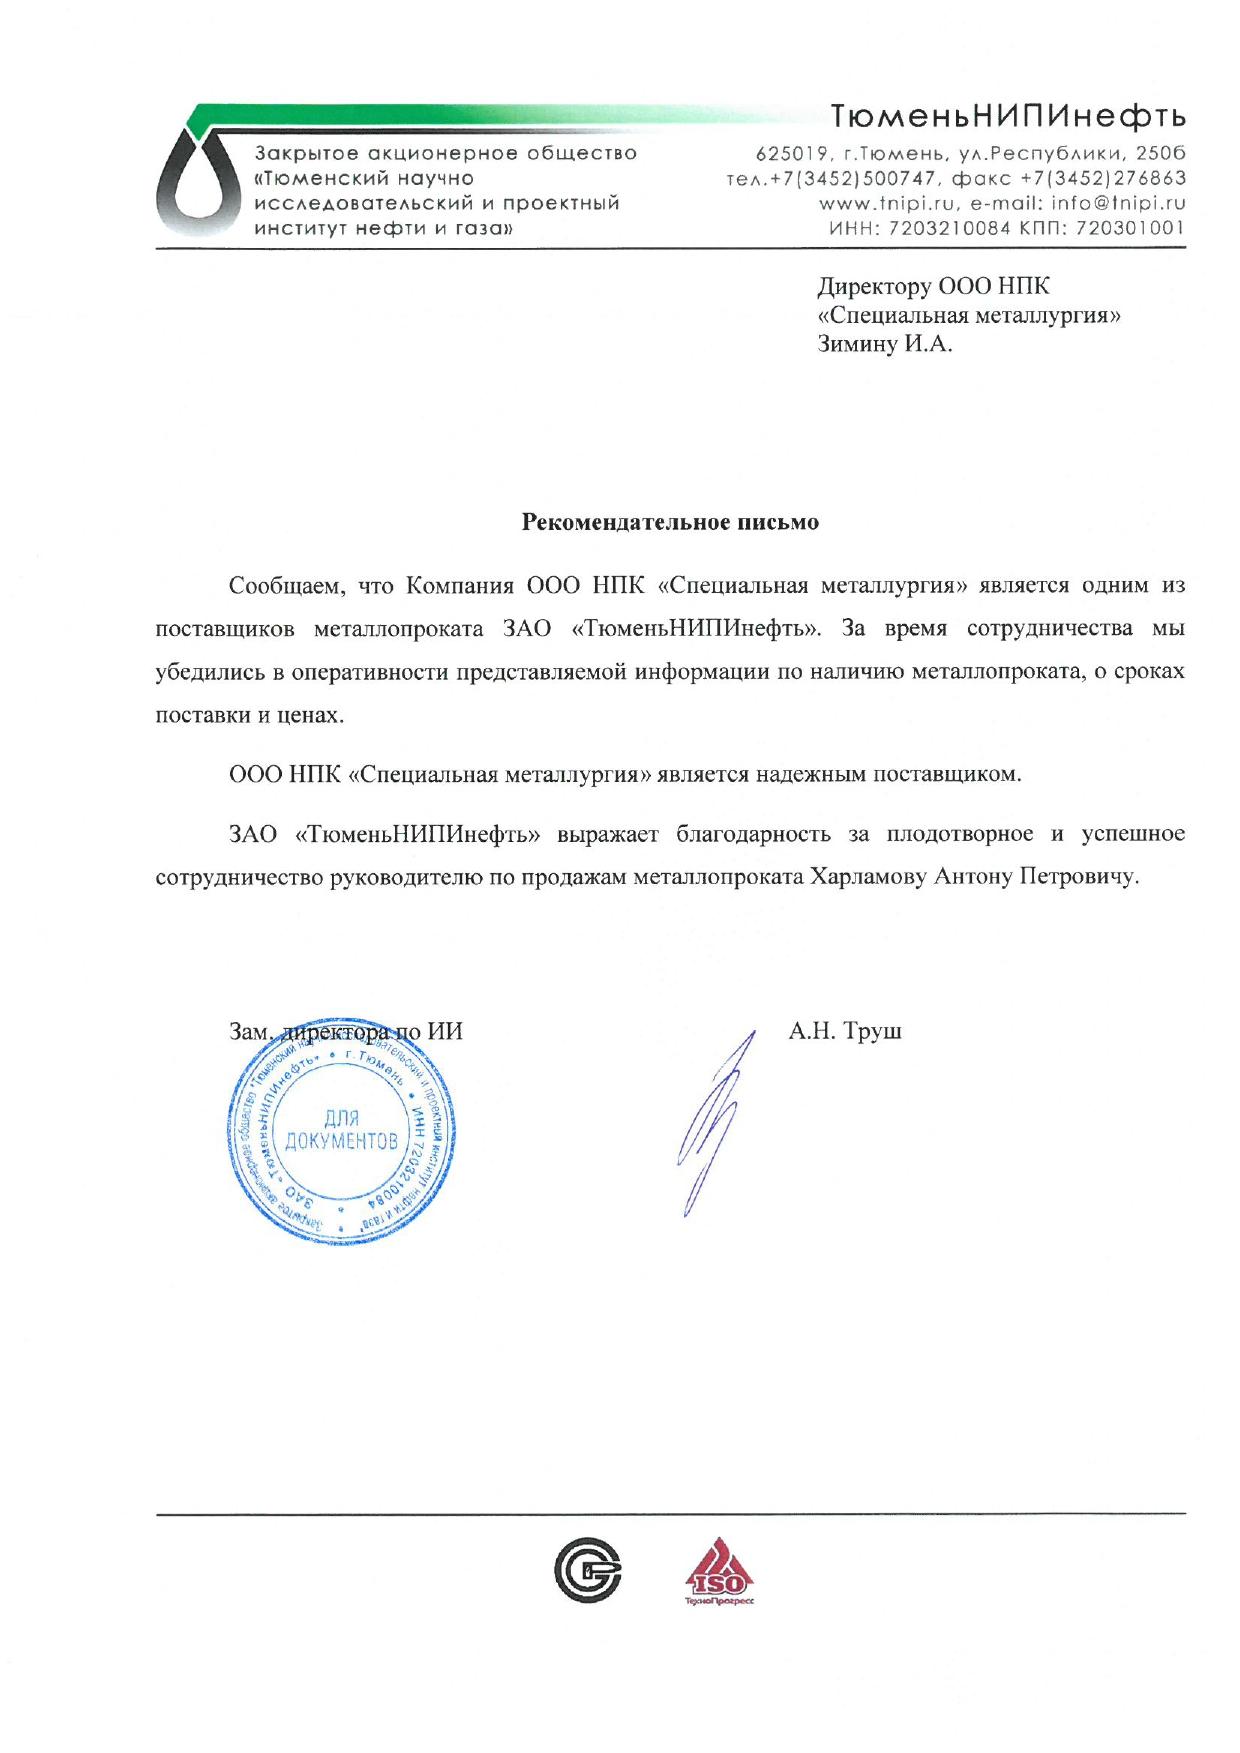 ЗАО ТюменьНИПИнефть